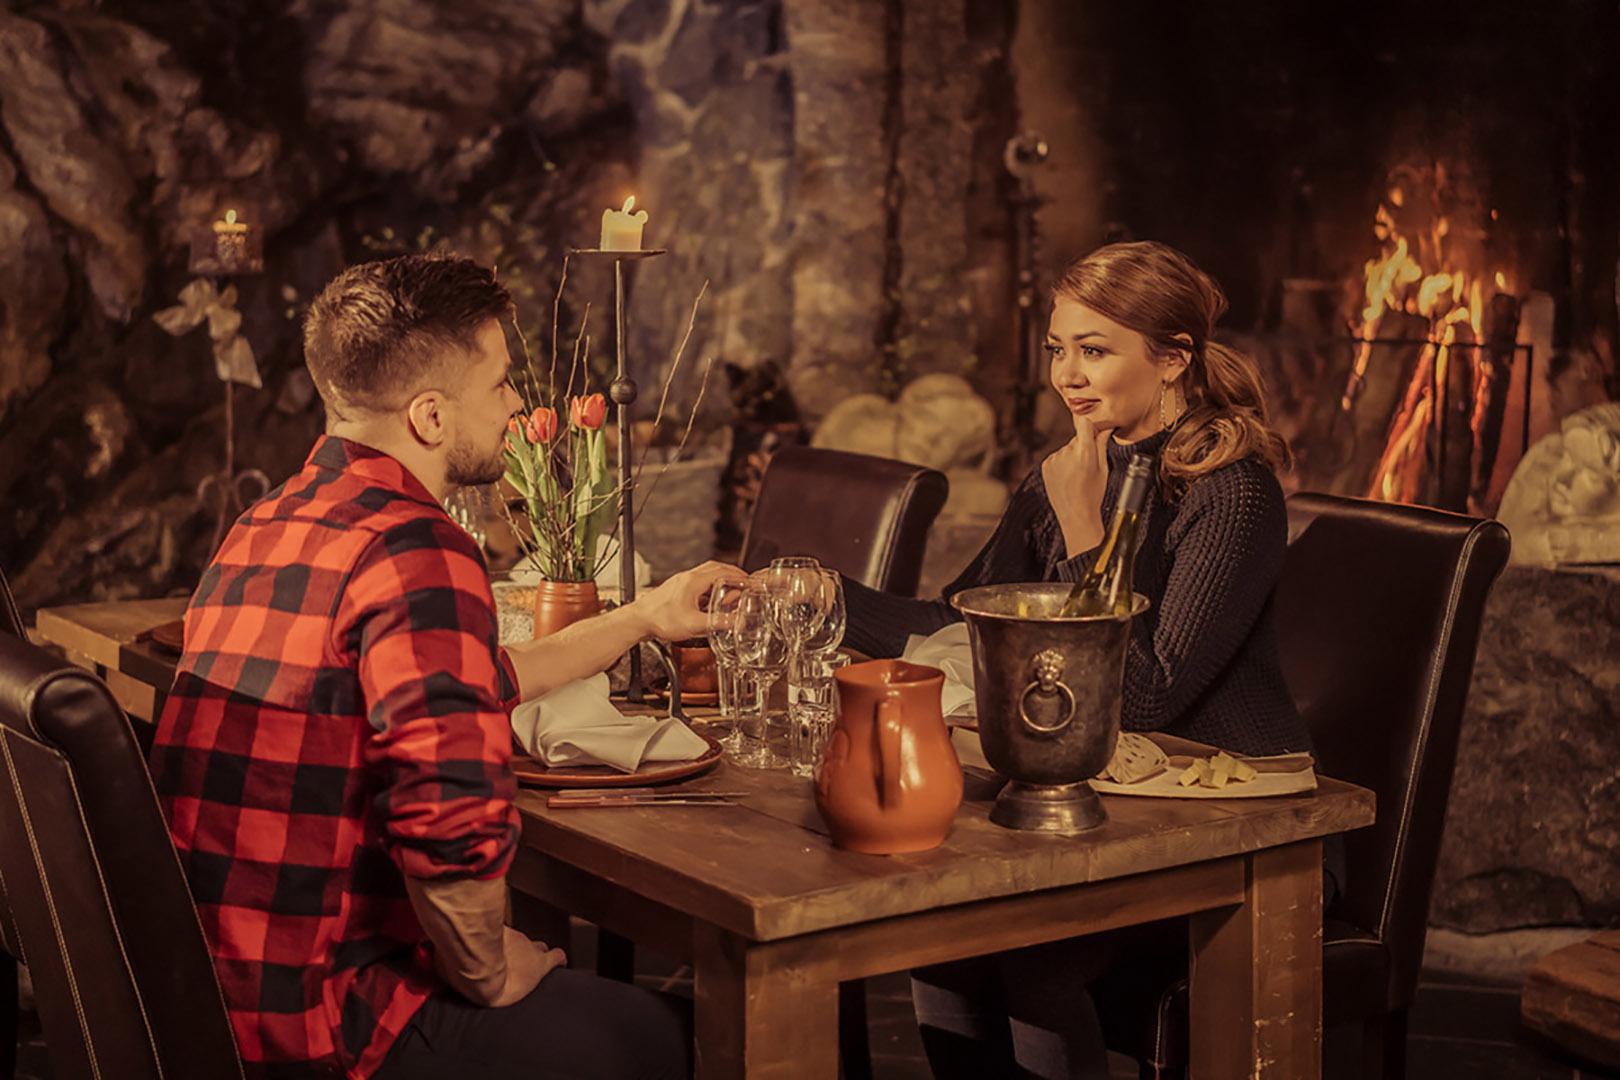 arvisydan_2_Restaurant_Hotel-Spa-Resort-Jarvisydan